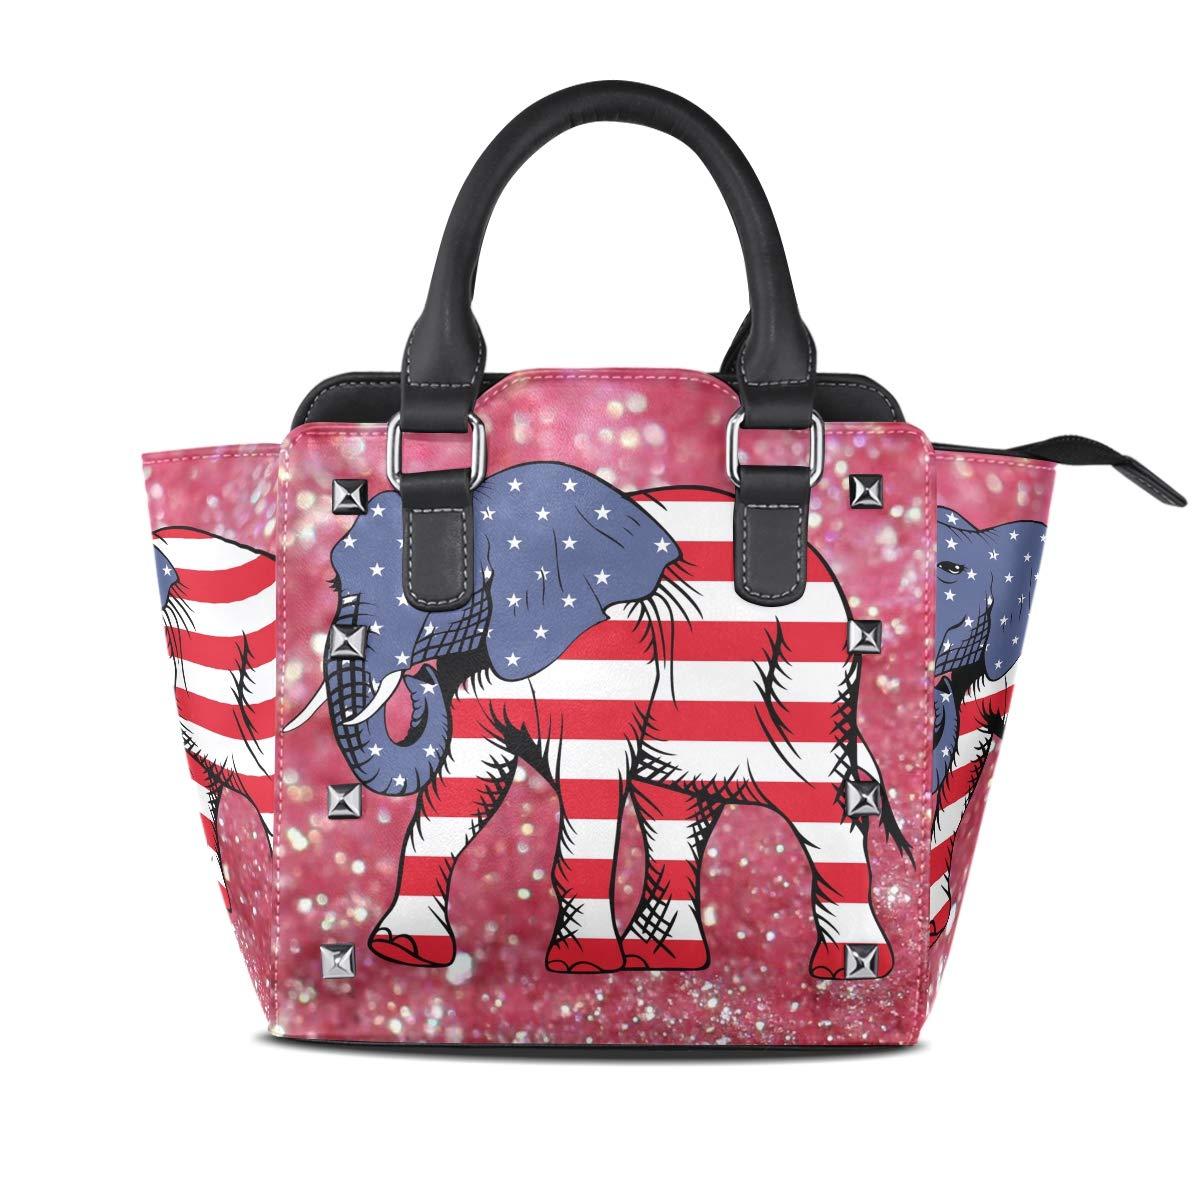 Design 2 Handbag American Flag Elephant In The Galaxy Genuine Leather Tote Rivet Bag Shoulder Strap Top Handle Women